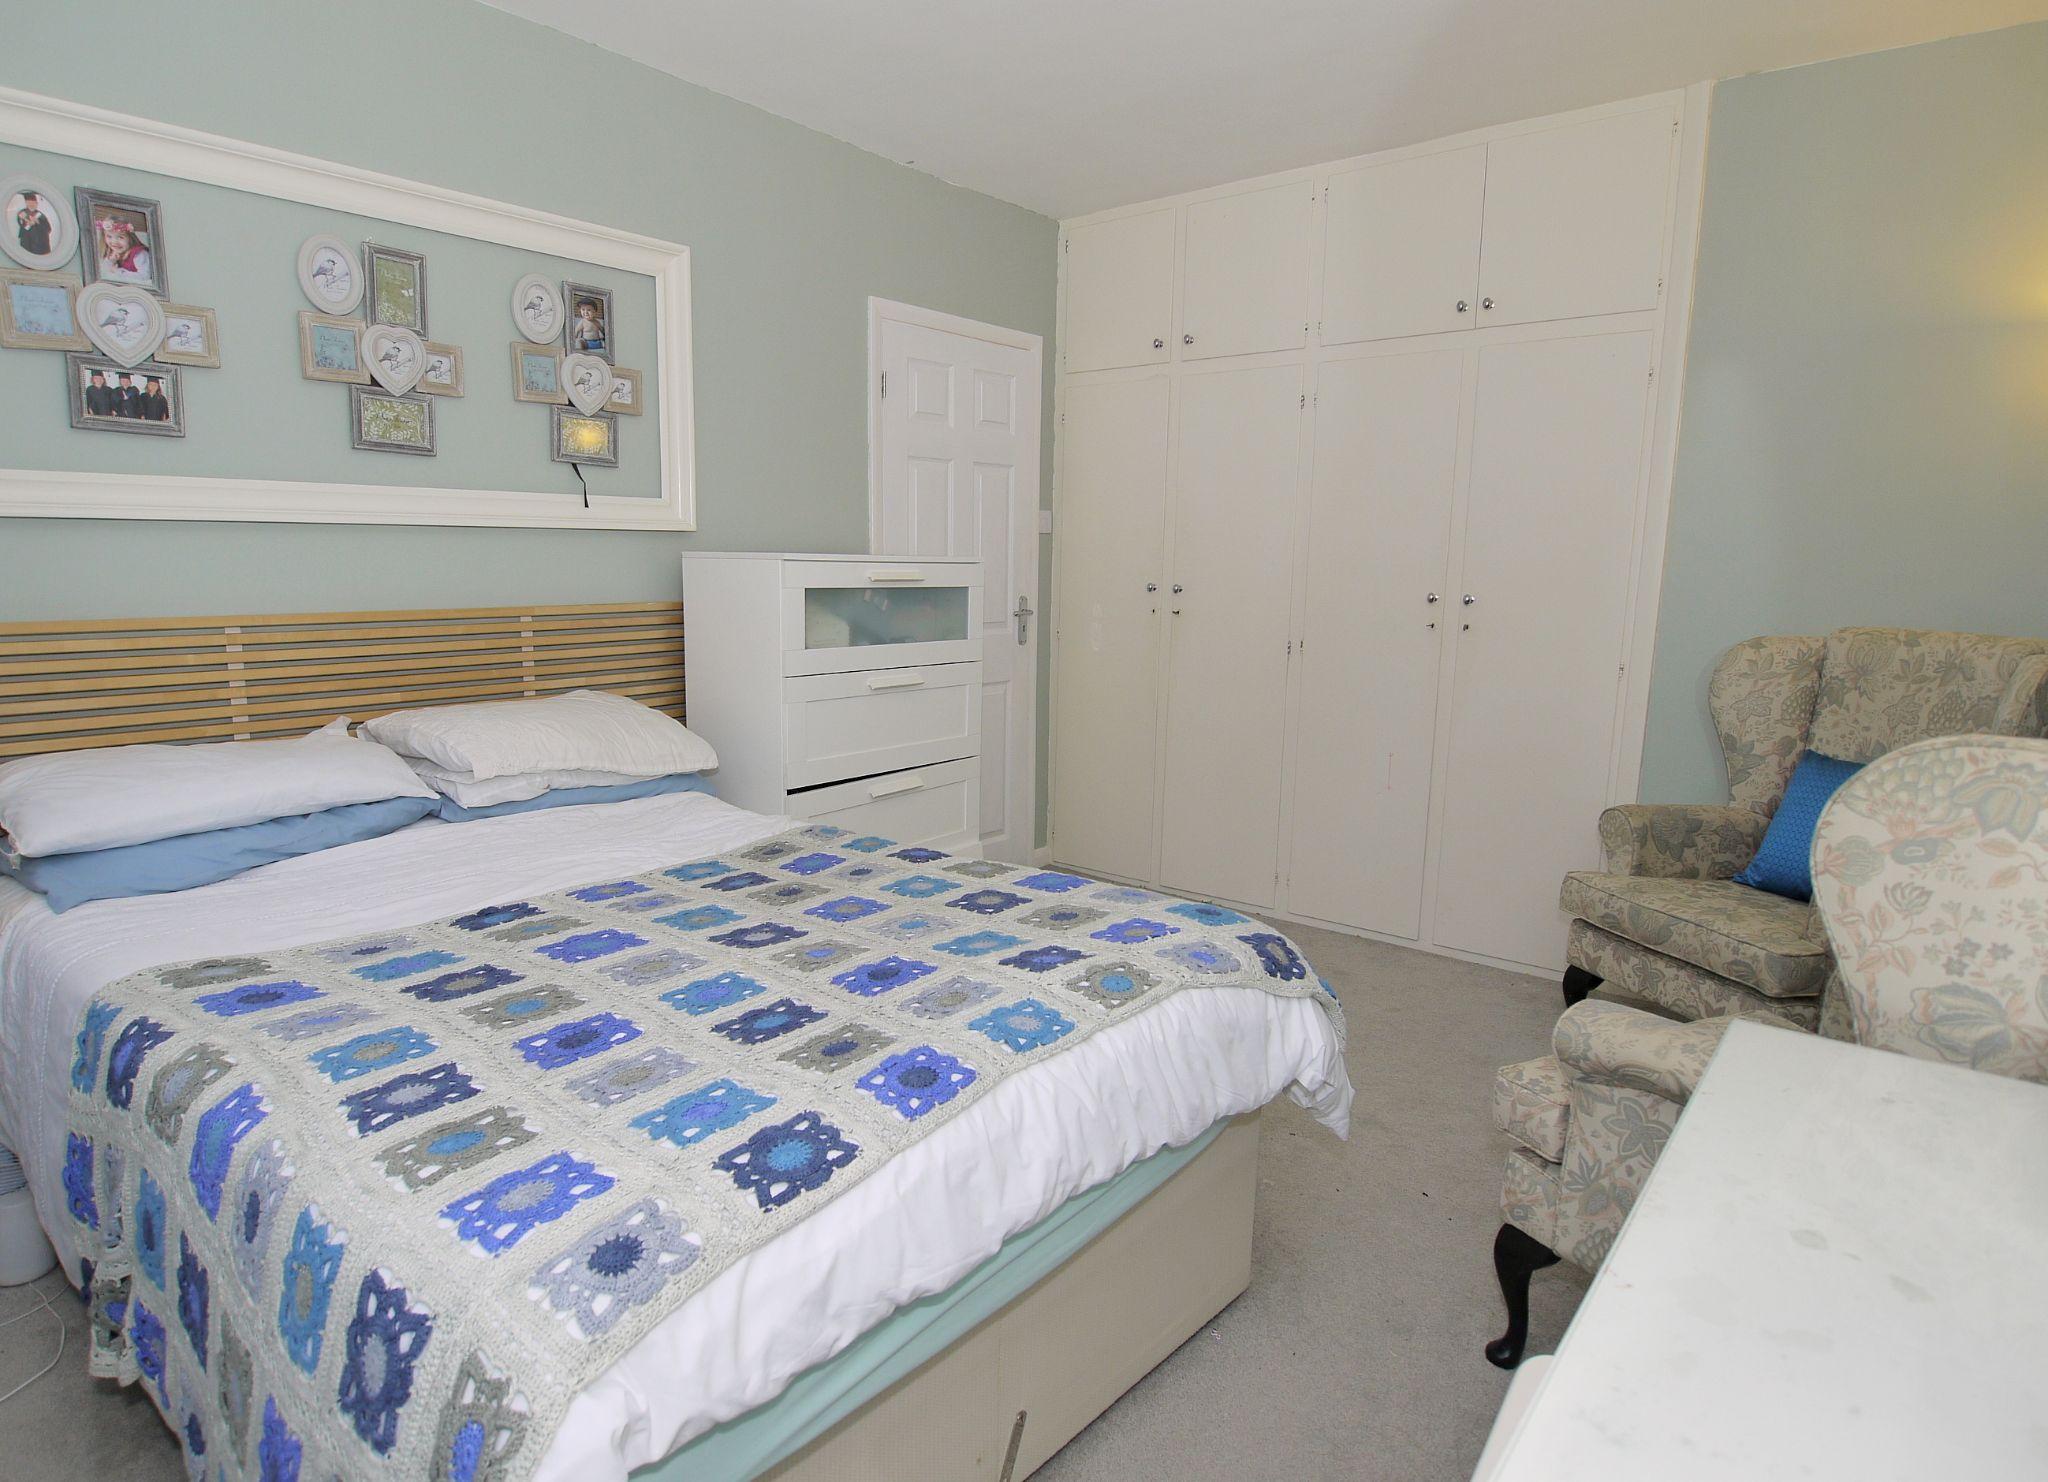 3 bedroom apartment Sold in Sevenoaks - Photograph 5